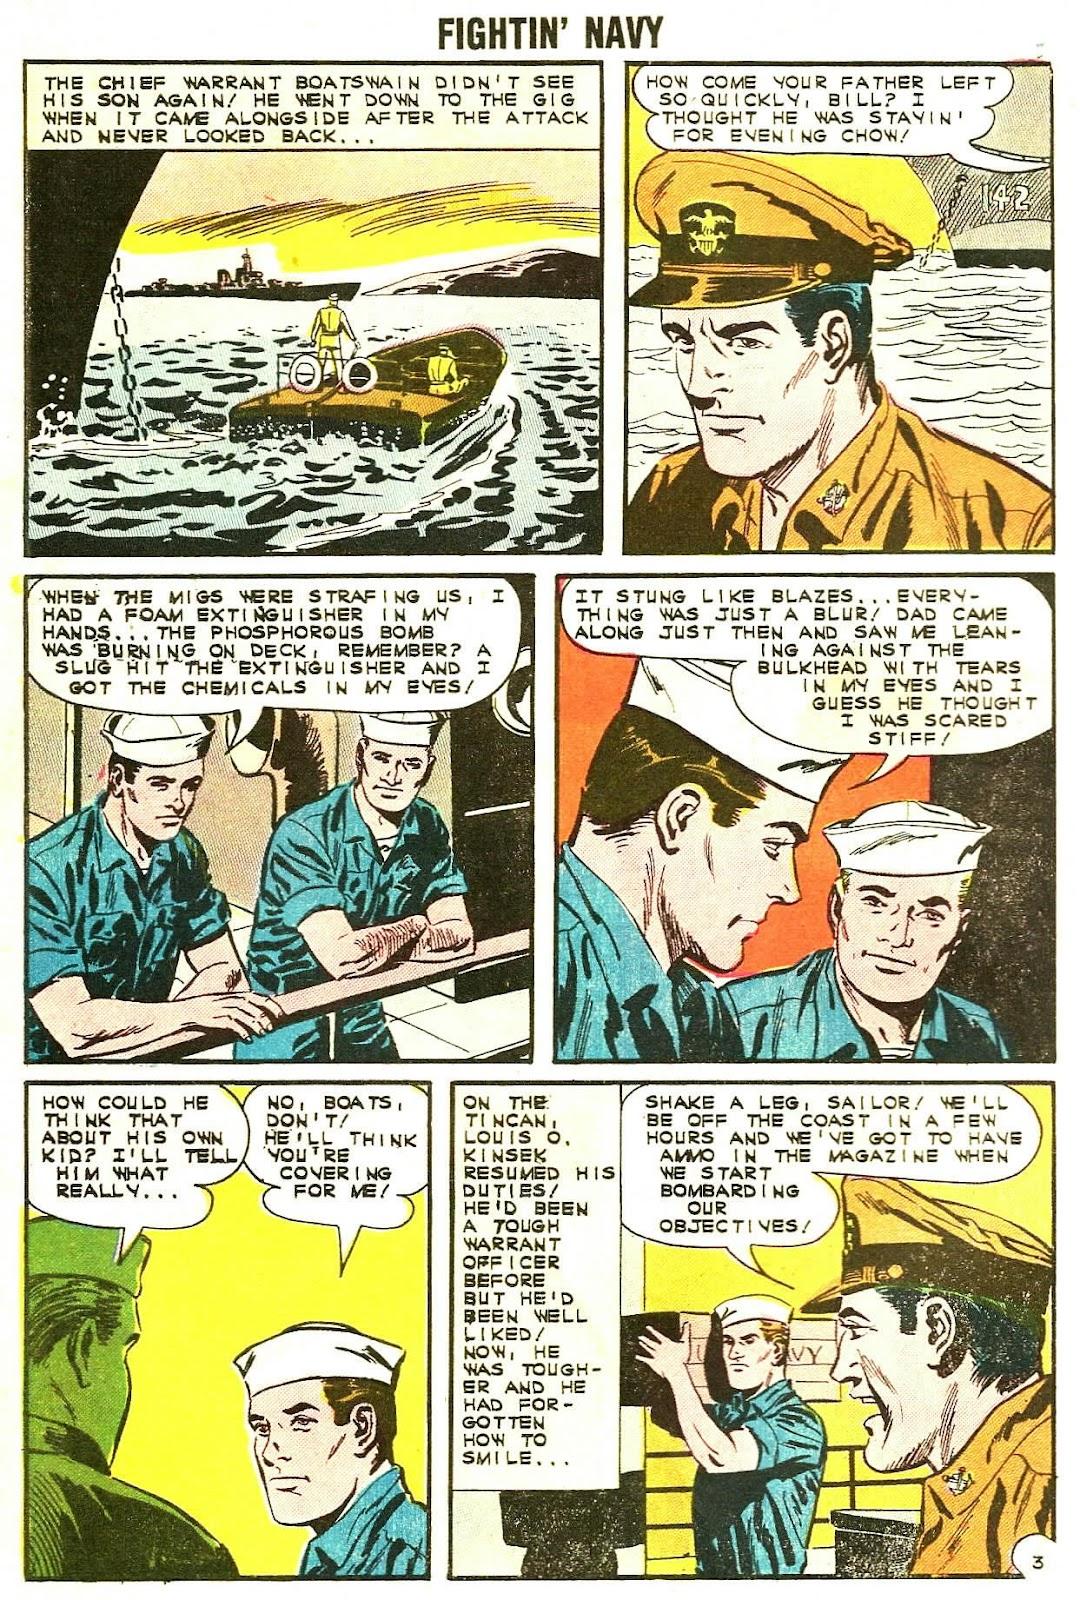 Read online Fightin' Navy comic -  Issue #107 - 10